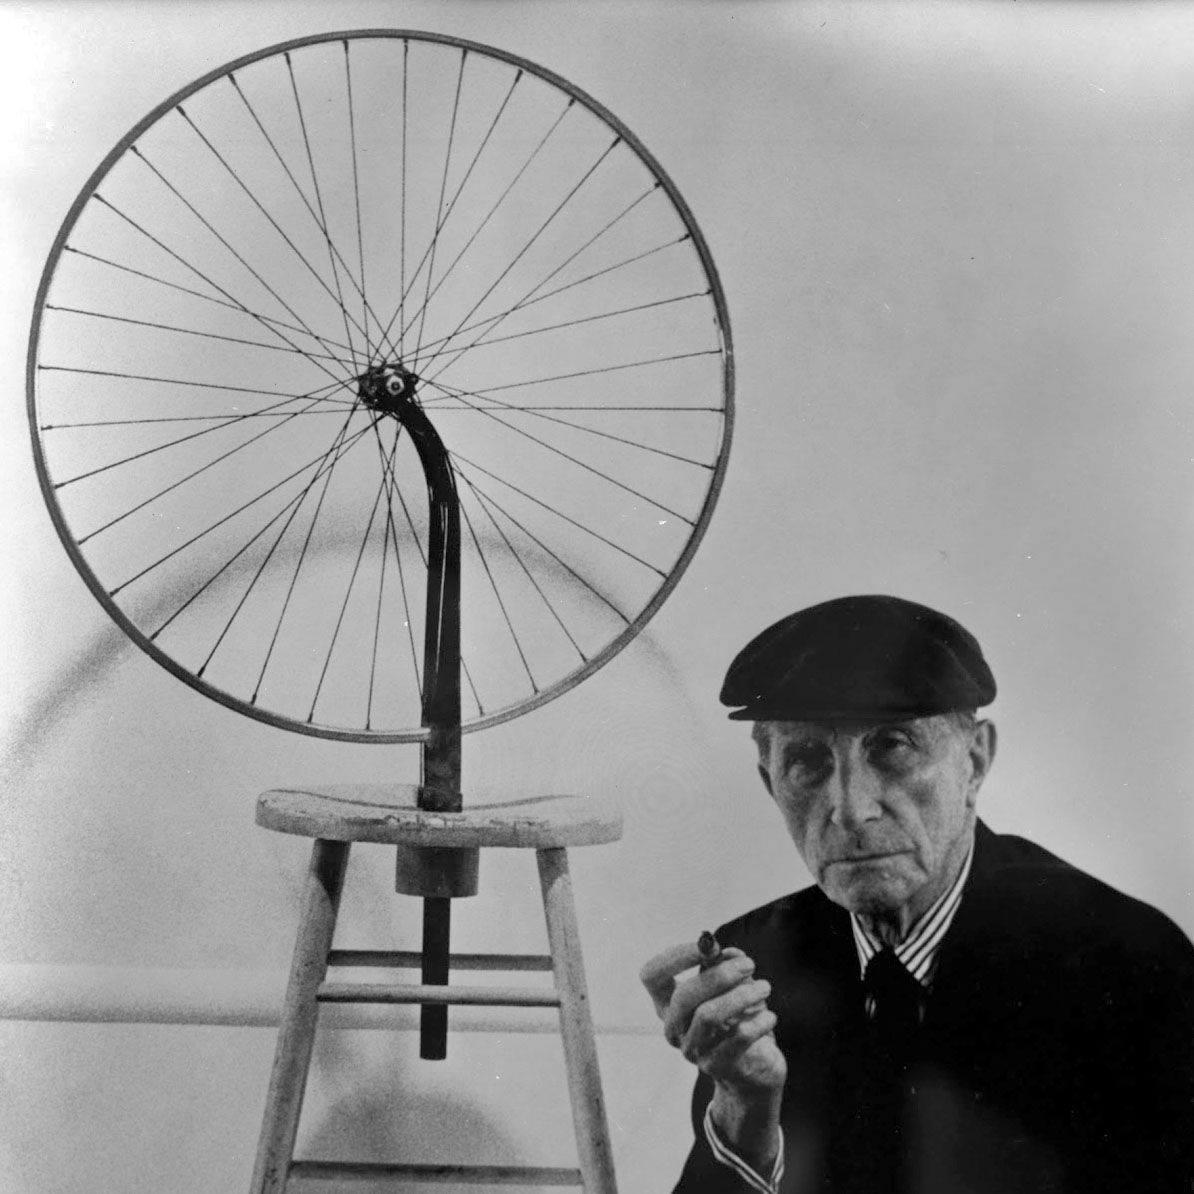 Chi era Marcel Duchamp